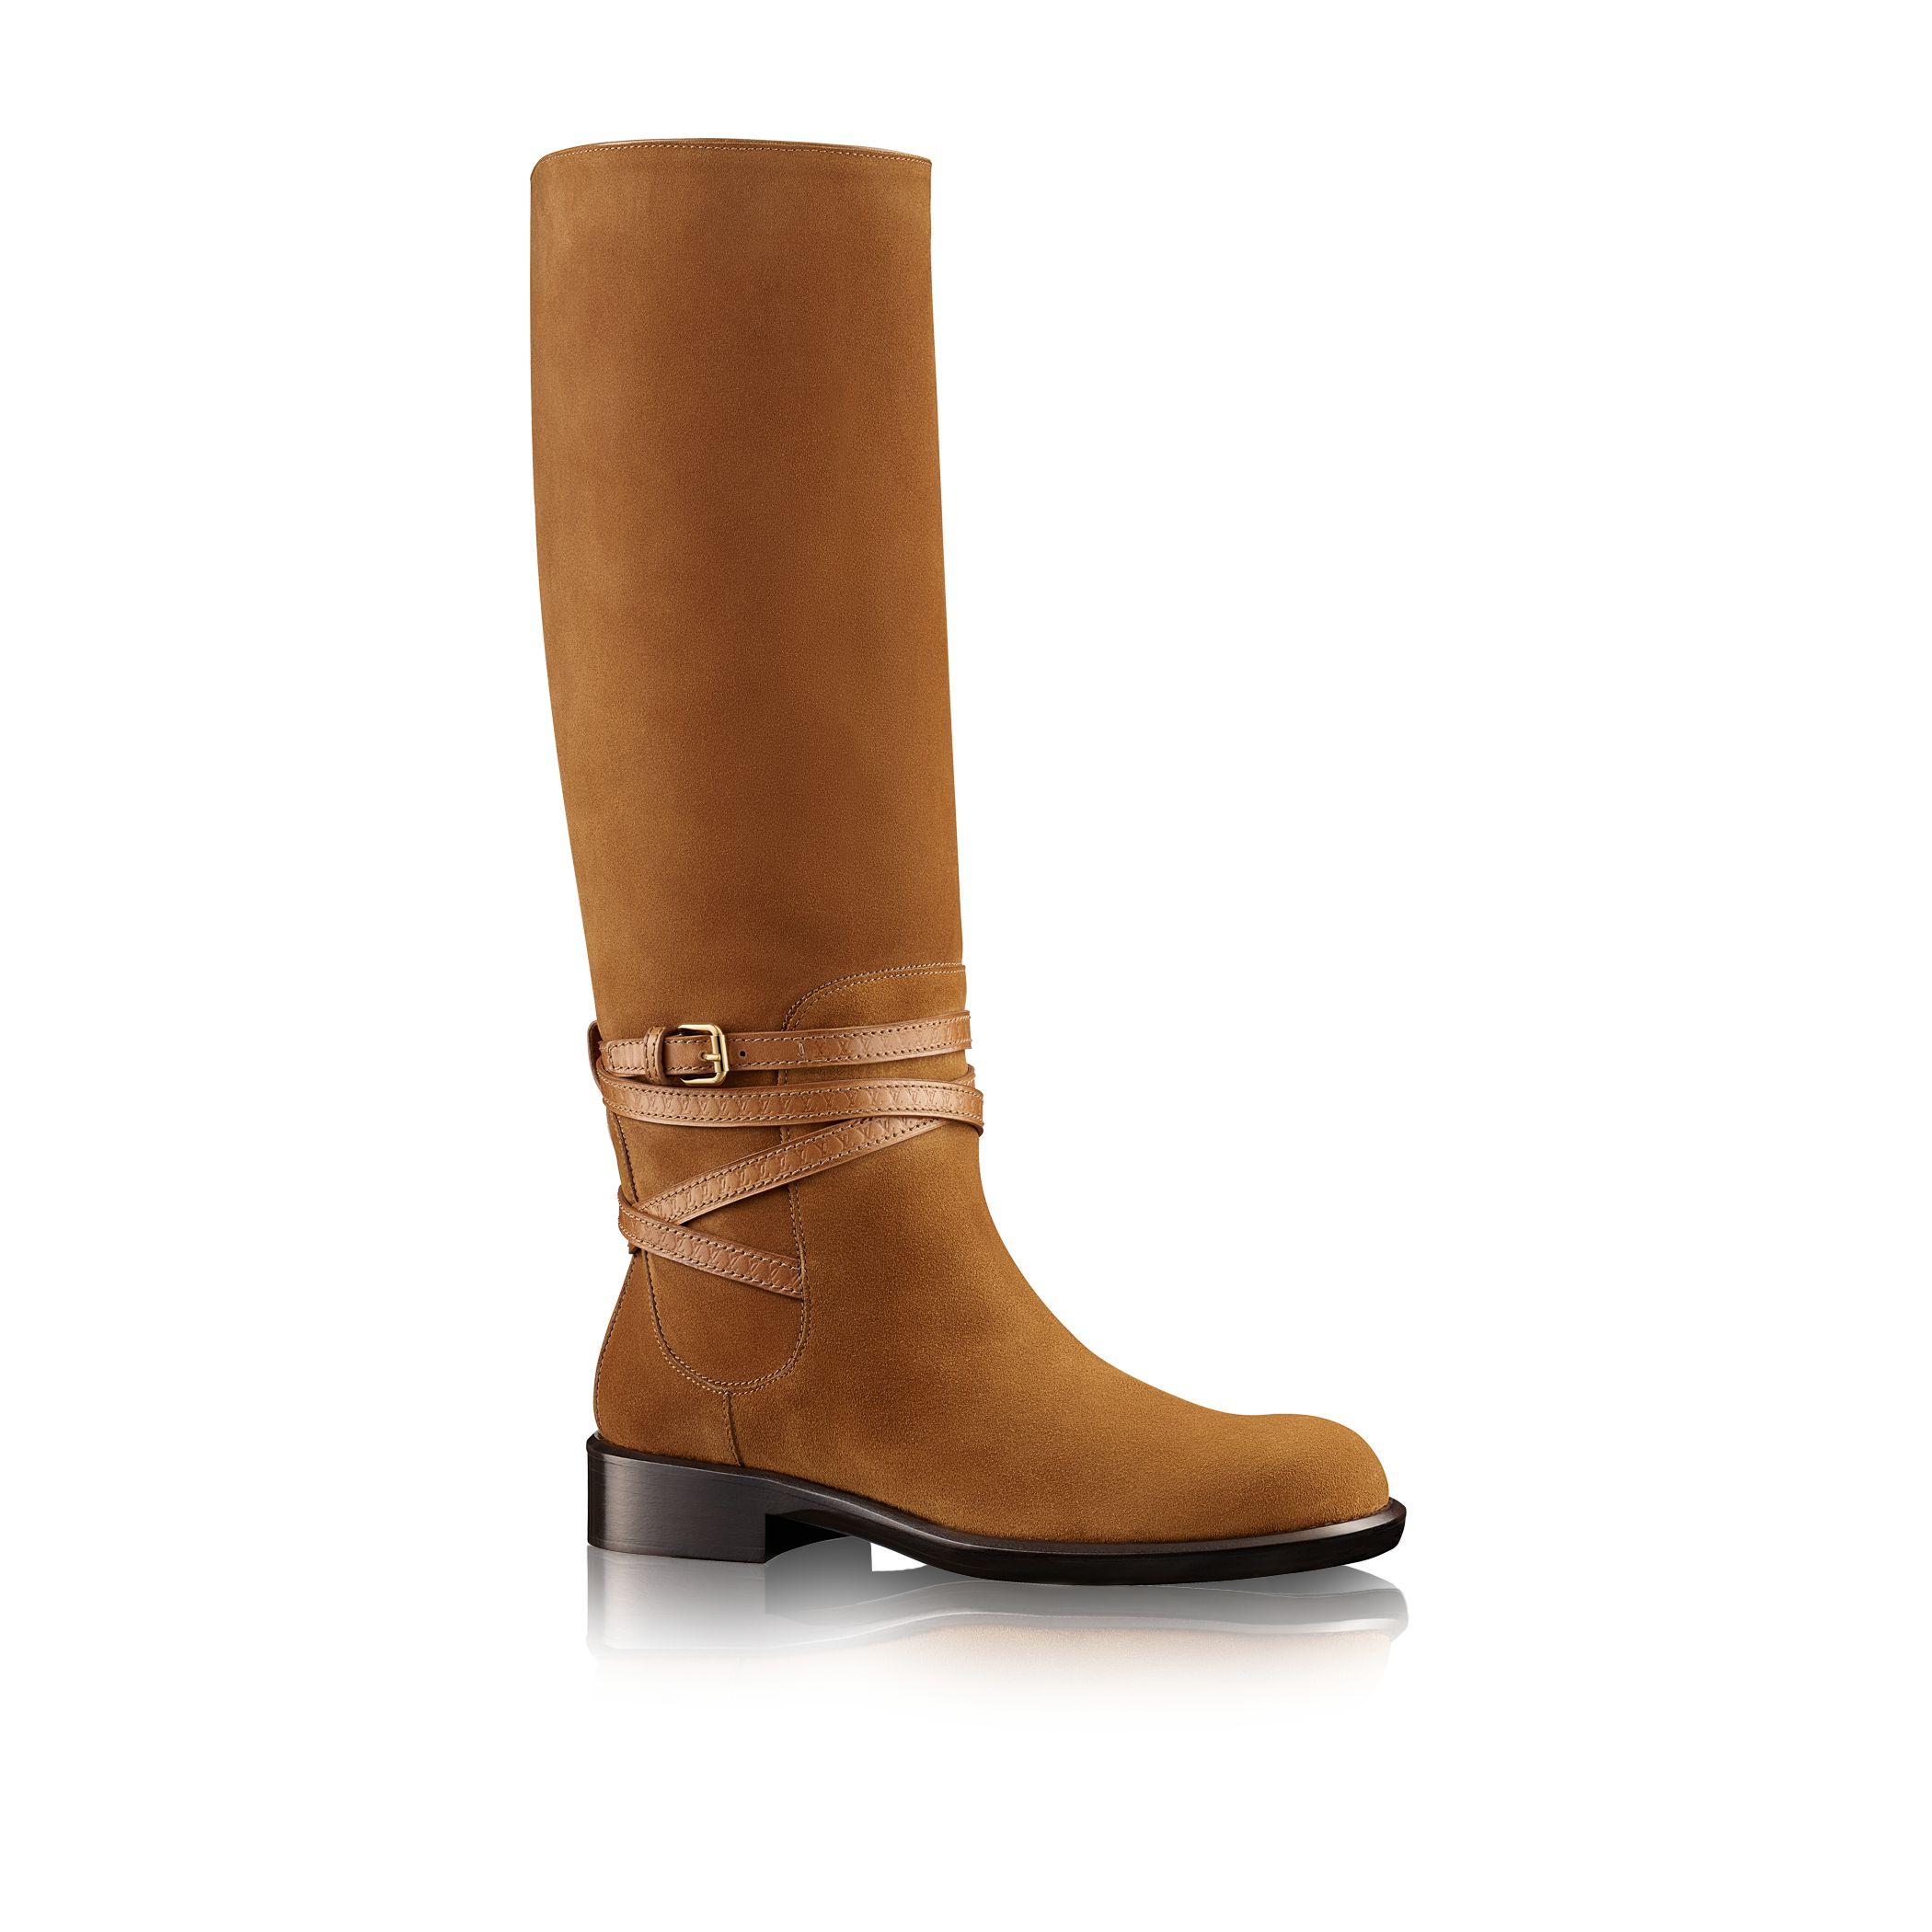 louis vuitton crossroads high boot in brown lyst